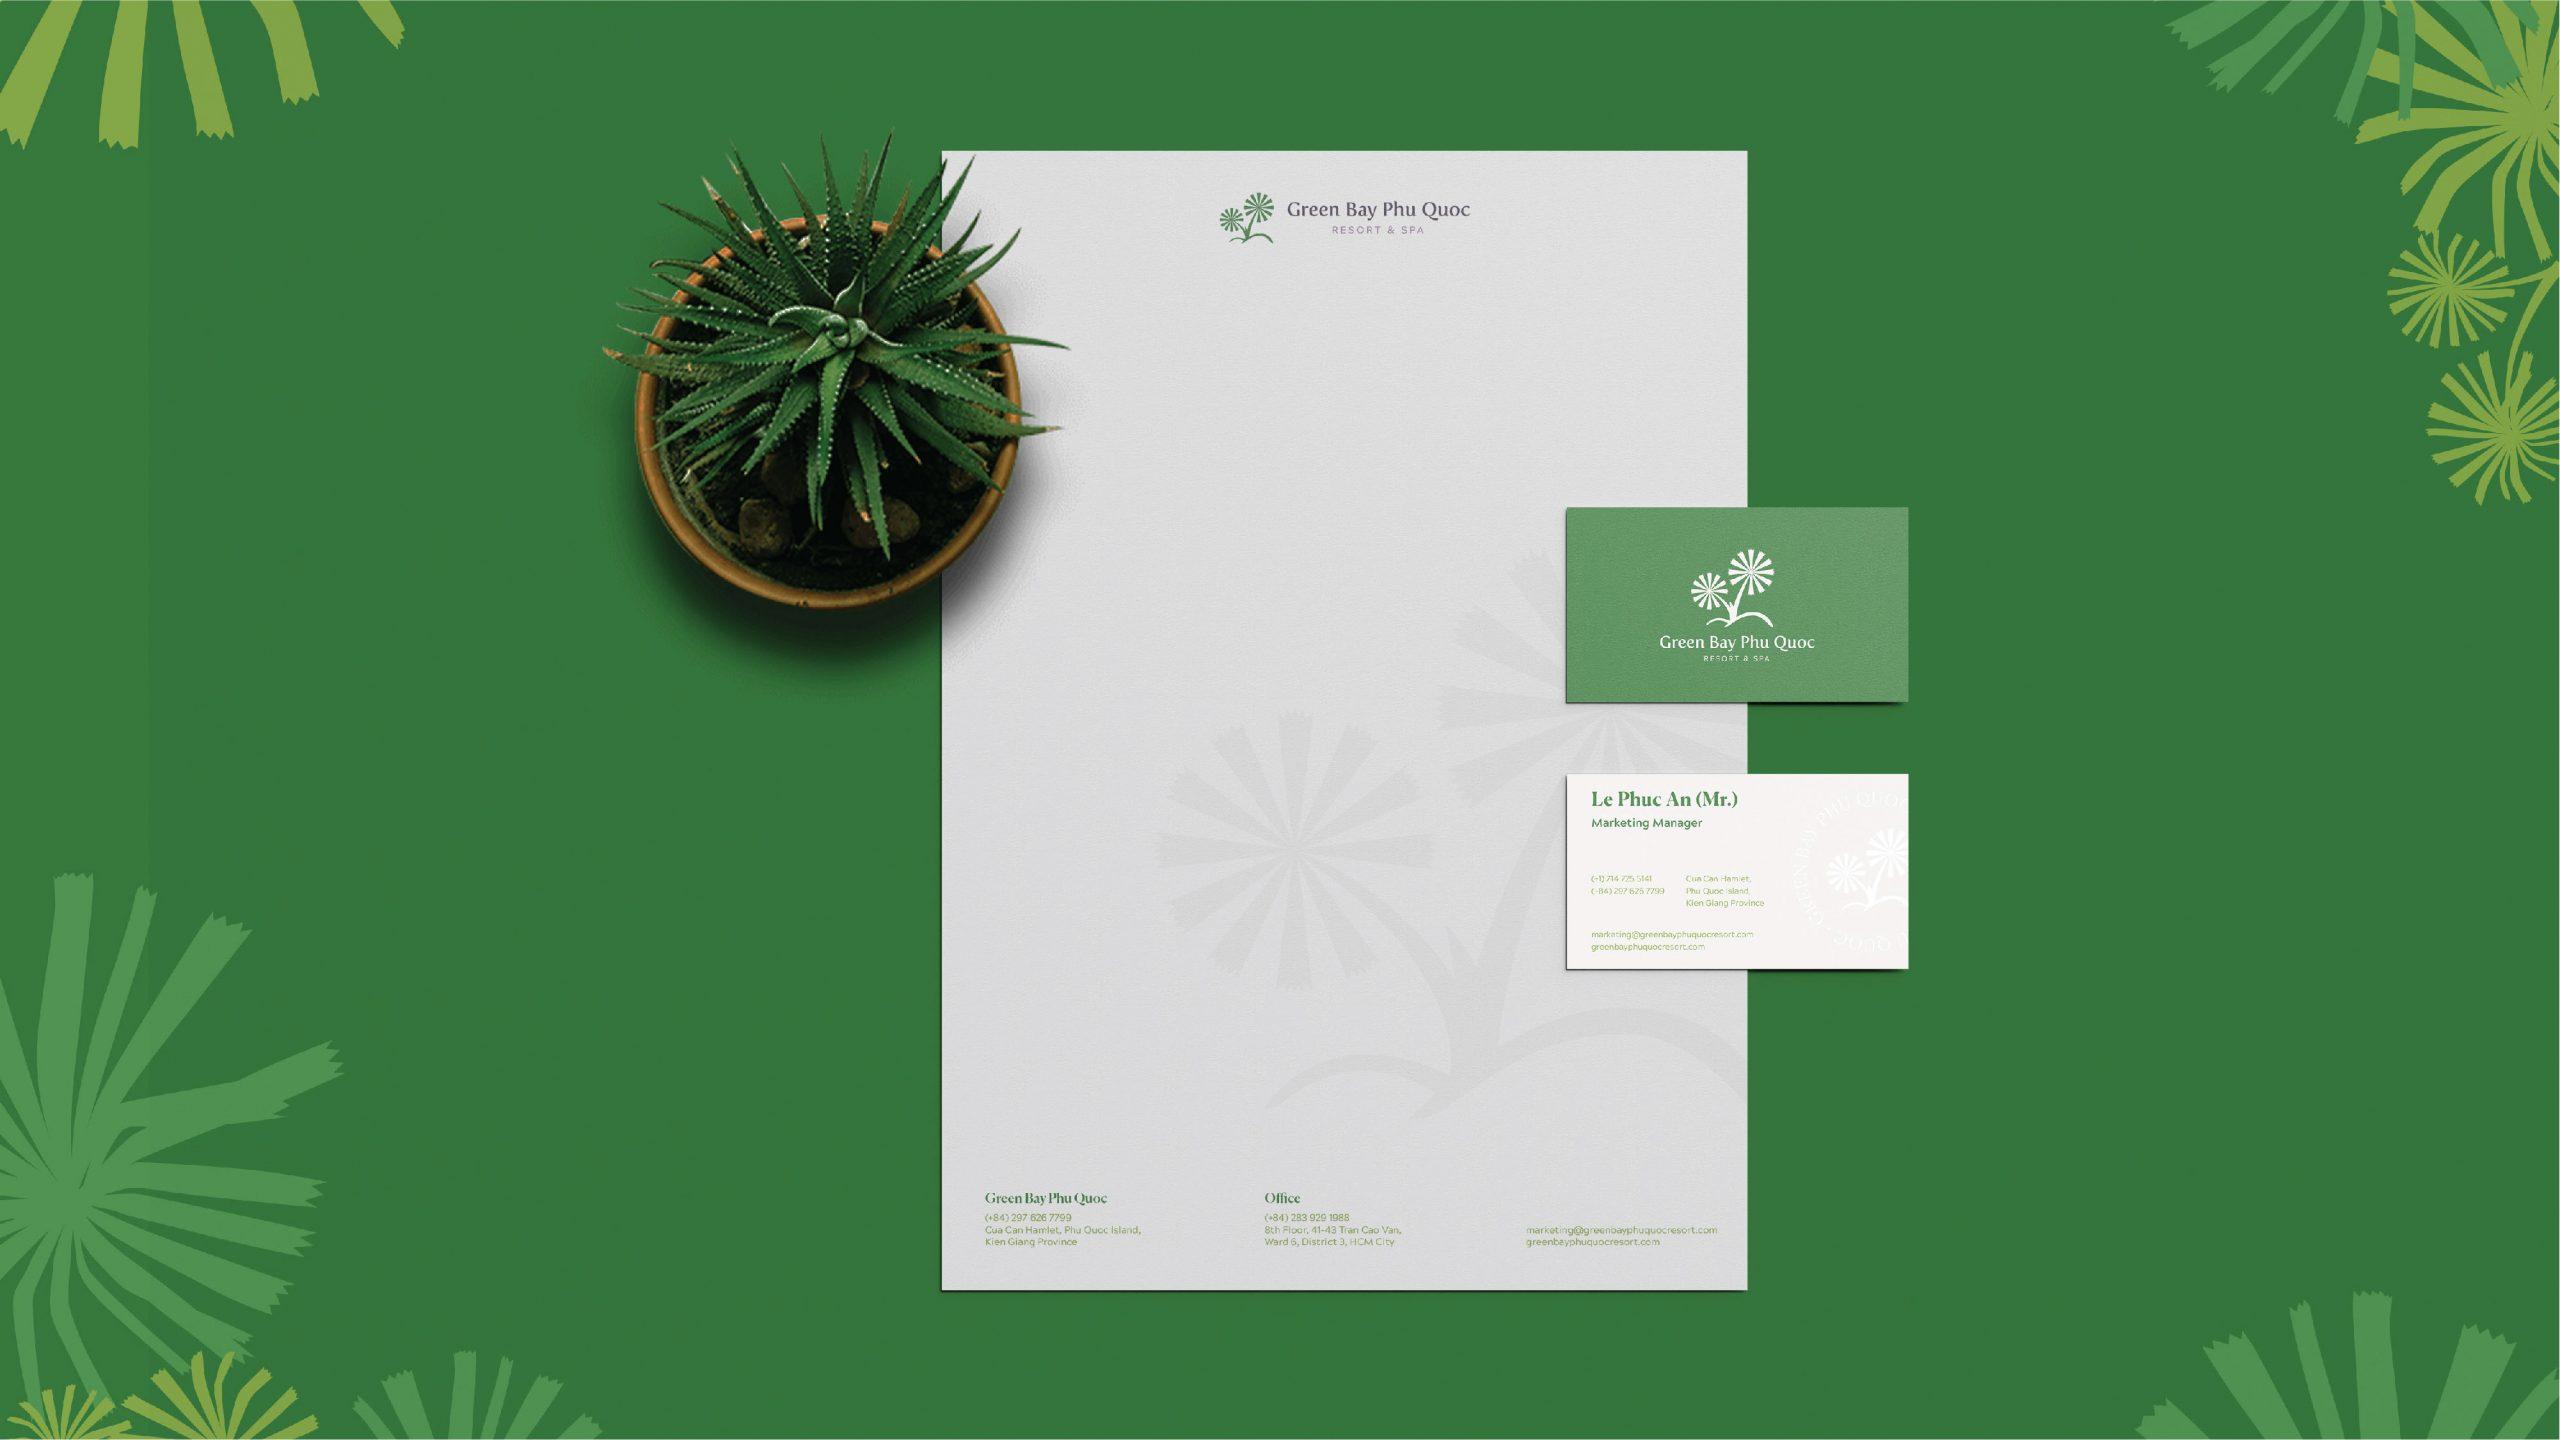 Greenbay-02